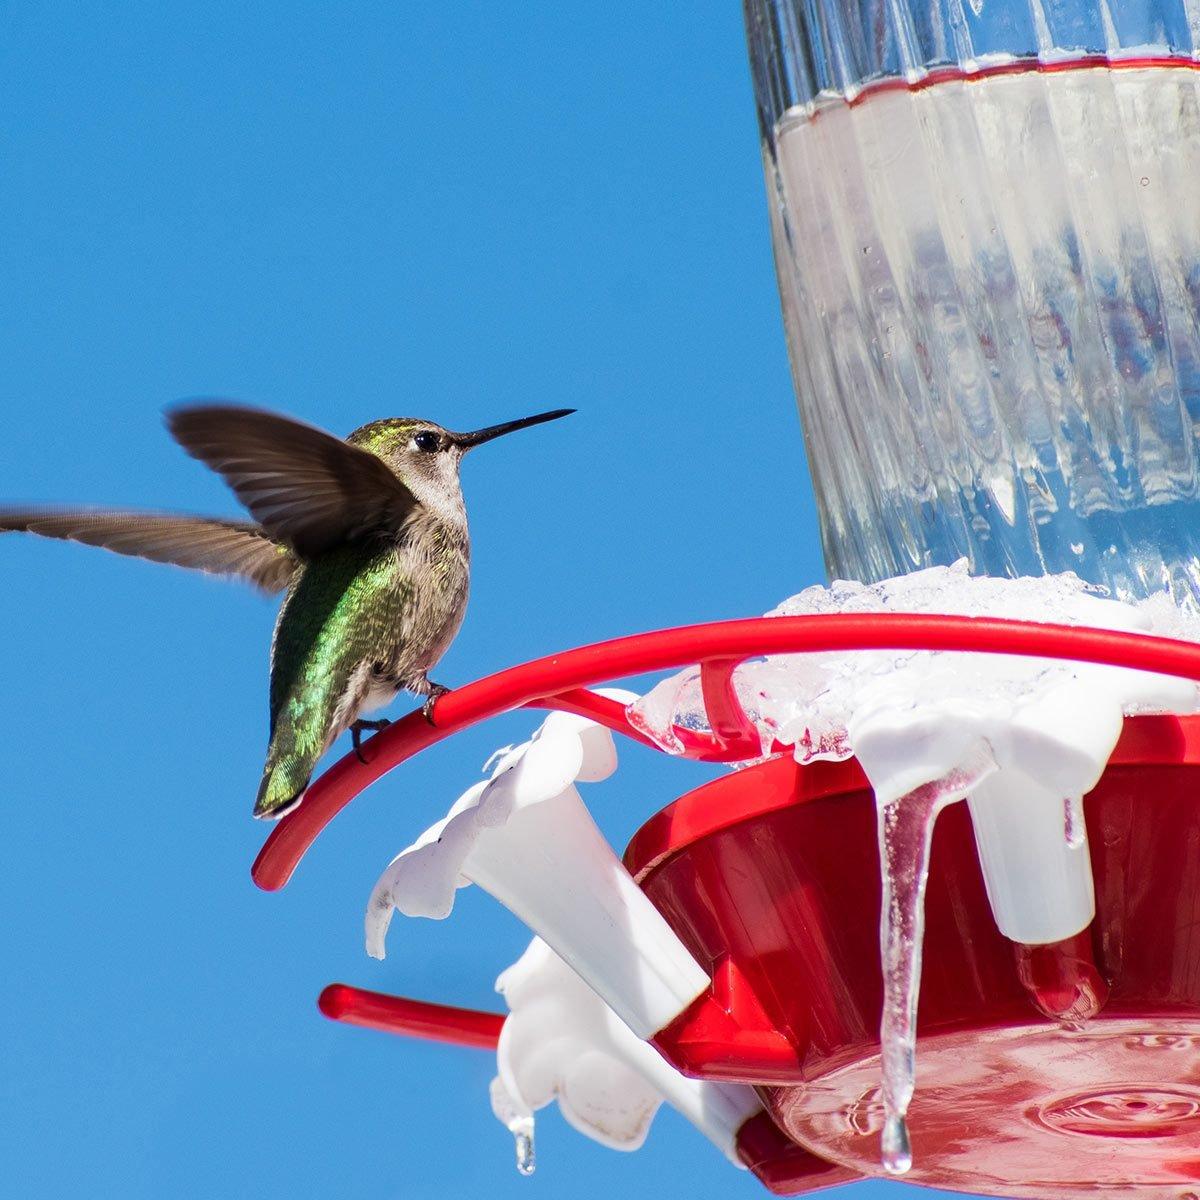 hummingbird in winter